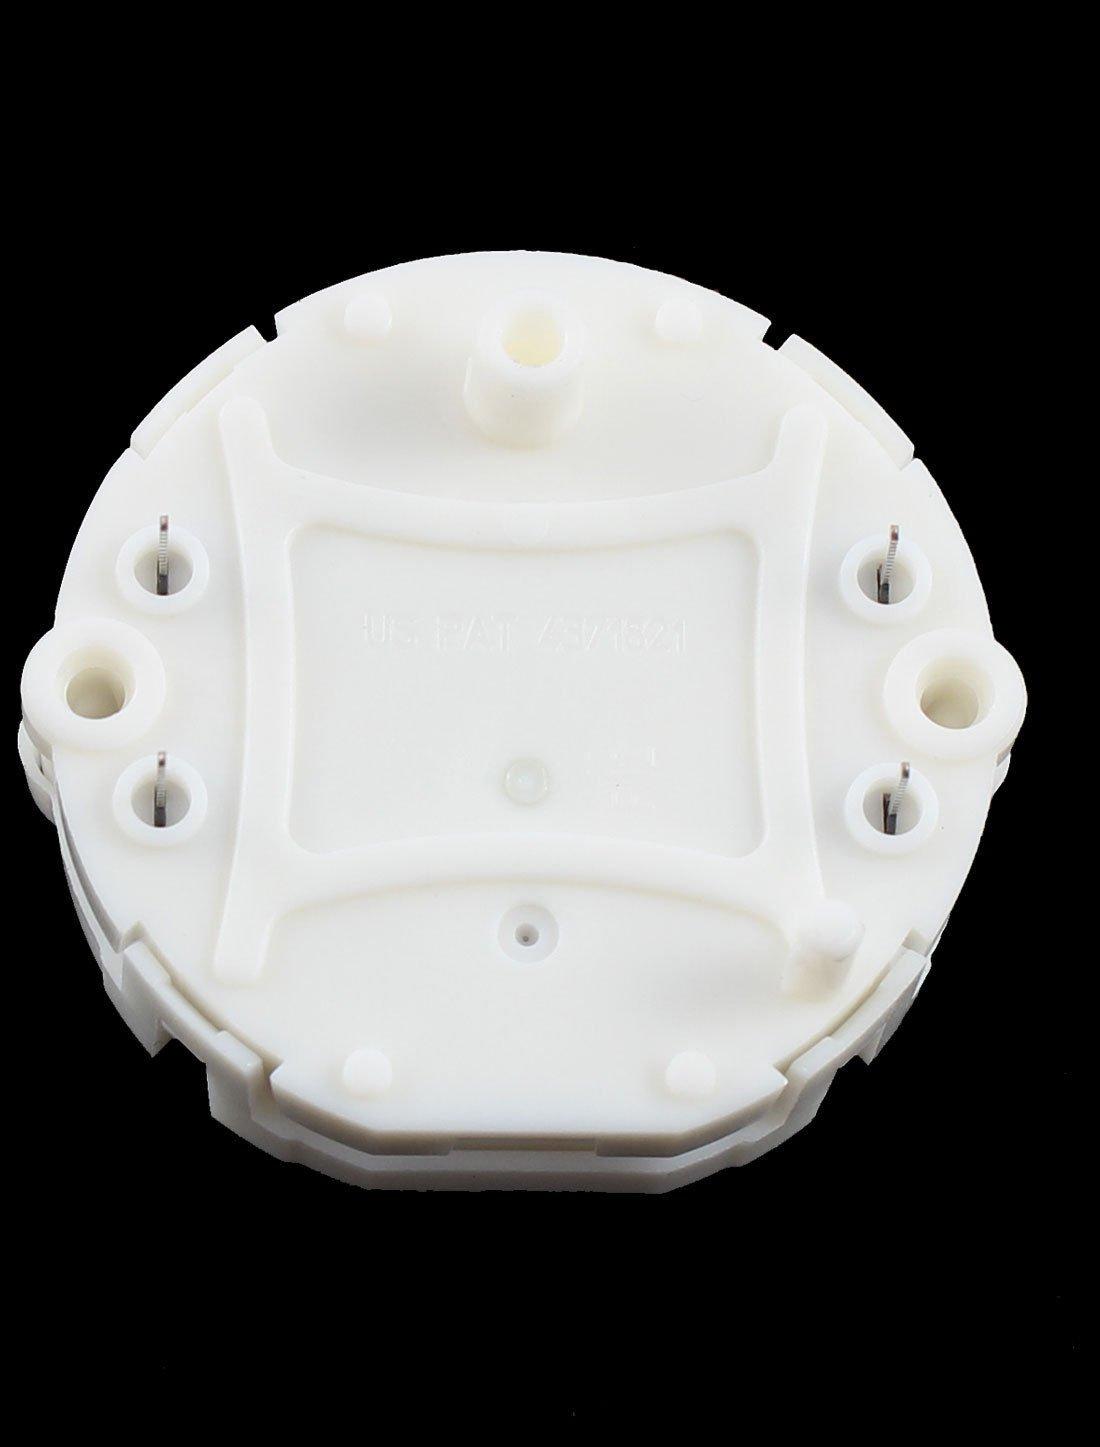 FOORDAY 100 Pcs Stepper Motor X27 168 Speedometer Gauge Repair Instrument Cluster Kits for GM GMC